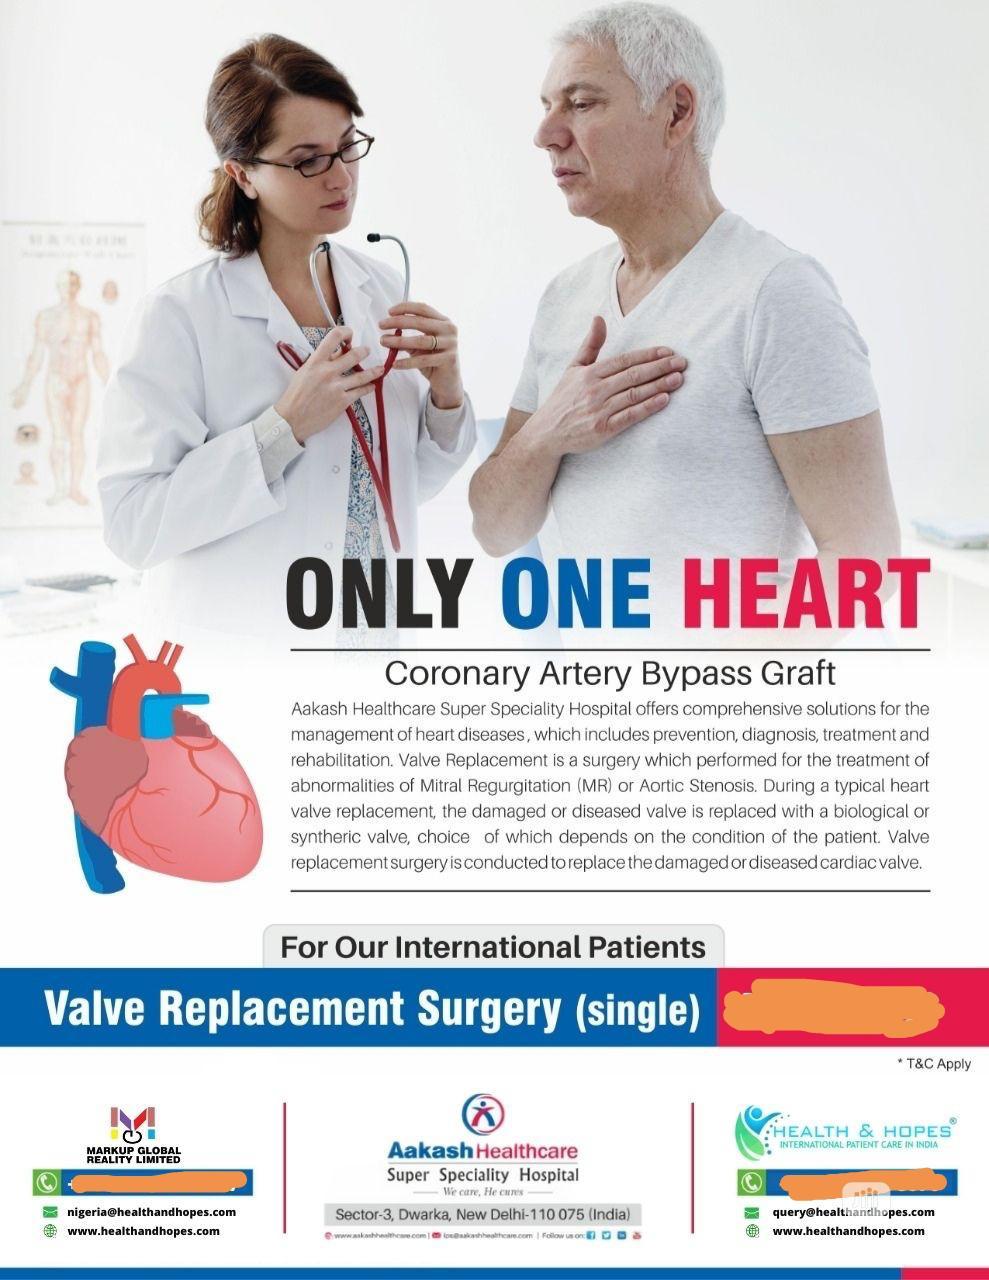 Valve Replacement Surgery